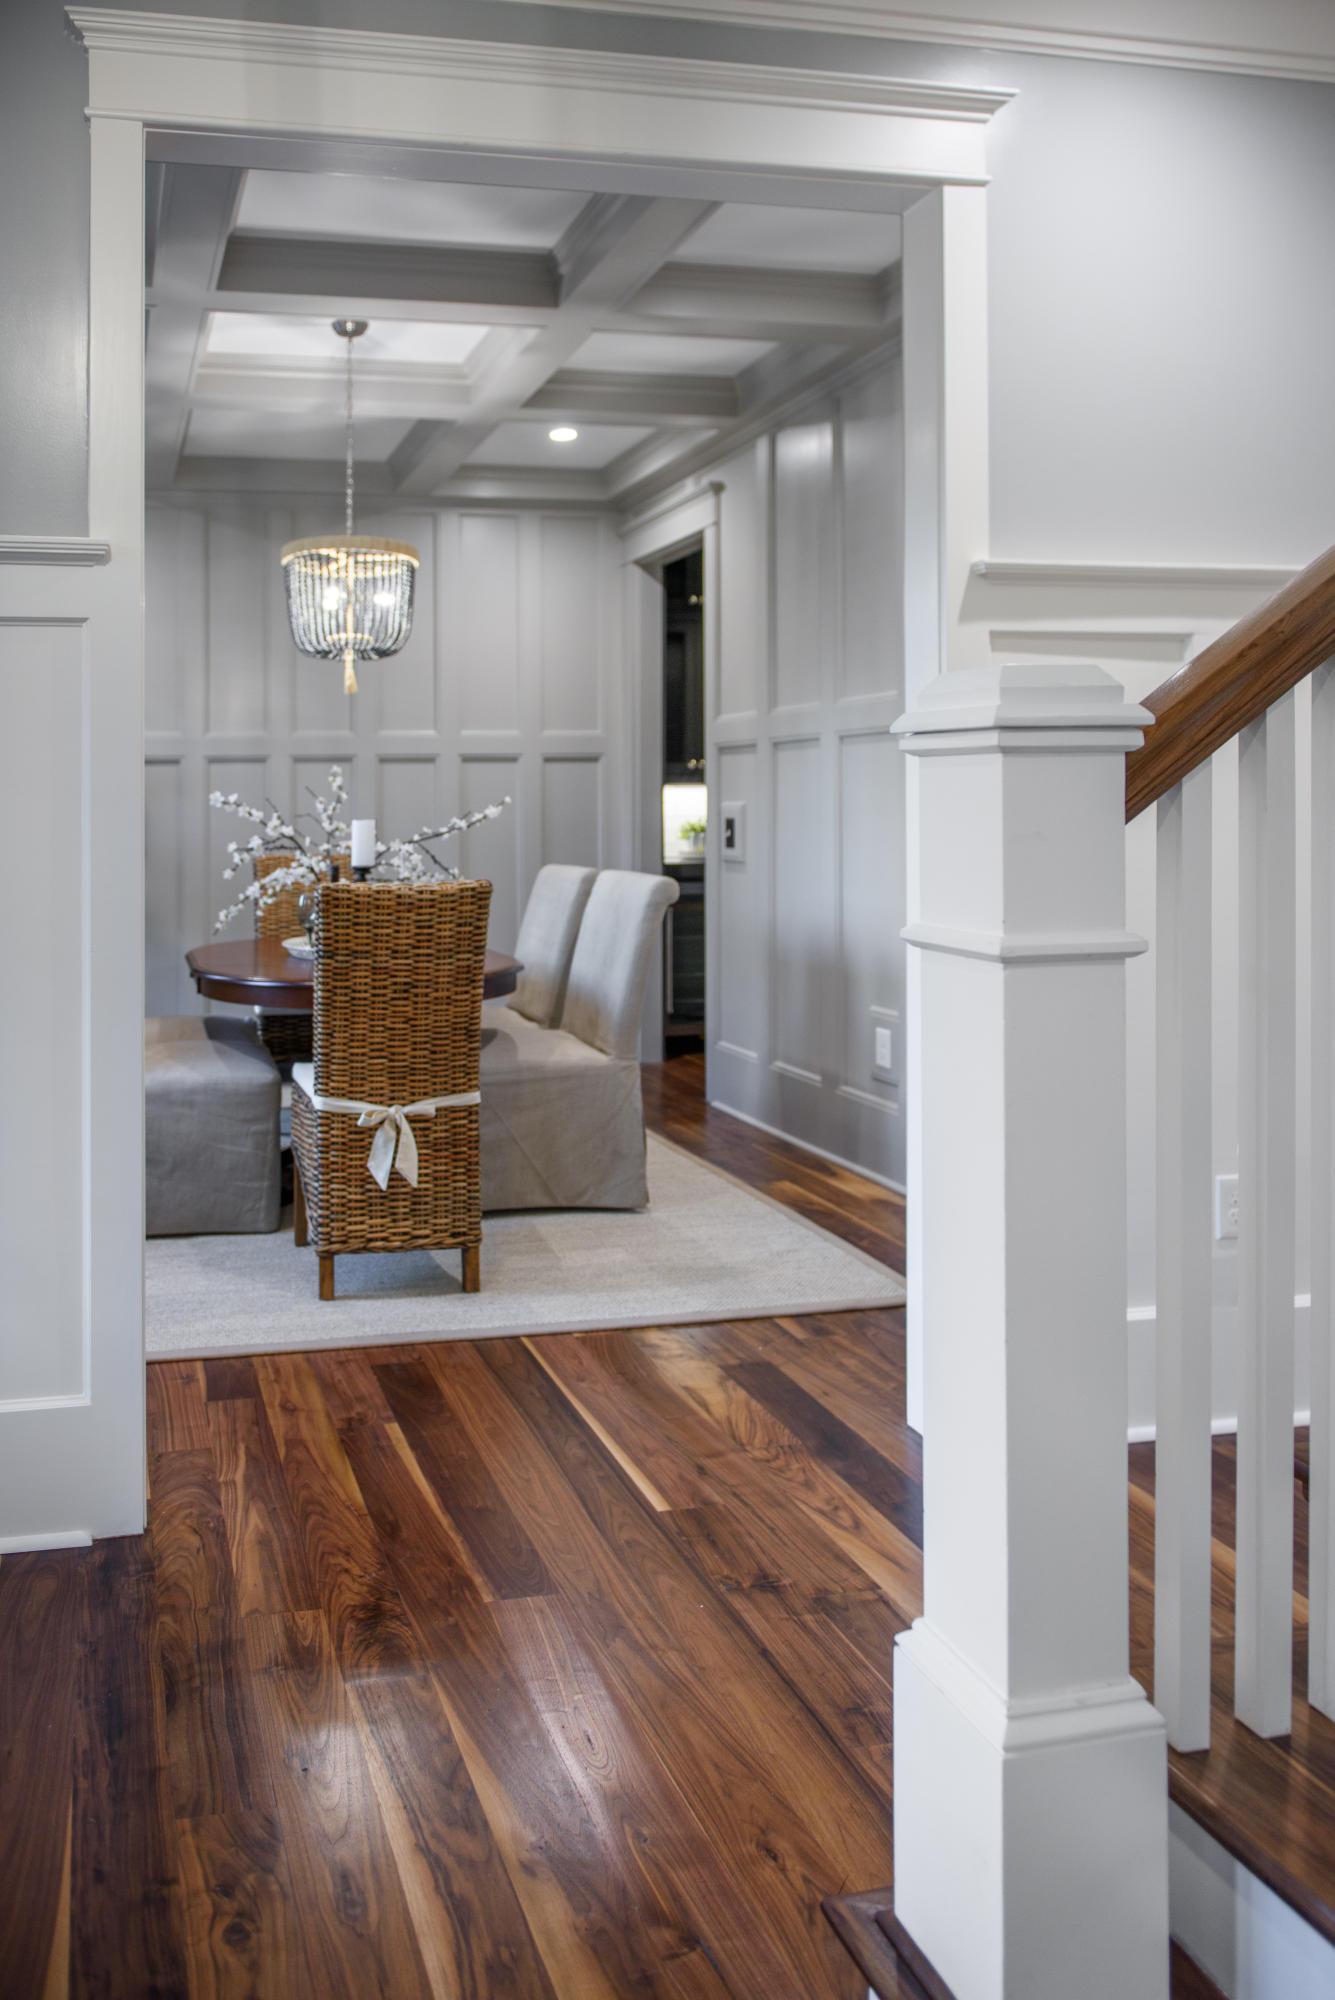 Mathis Ferry Court Homes For Sale - 1204 Clonmel, Mount Pleasant, SC - 49